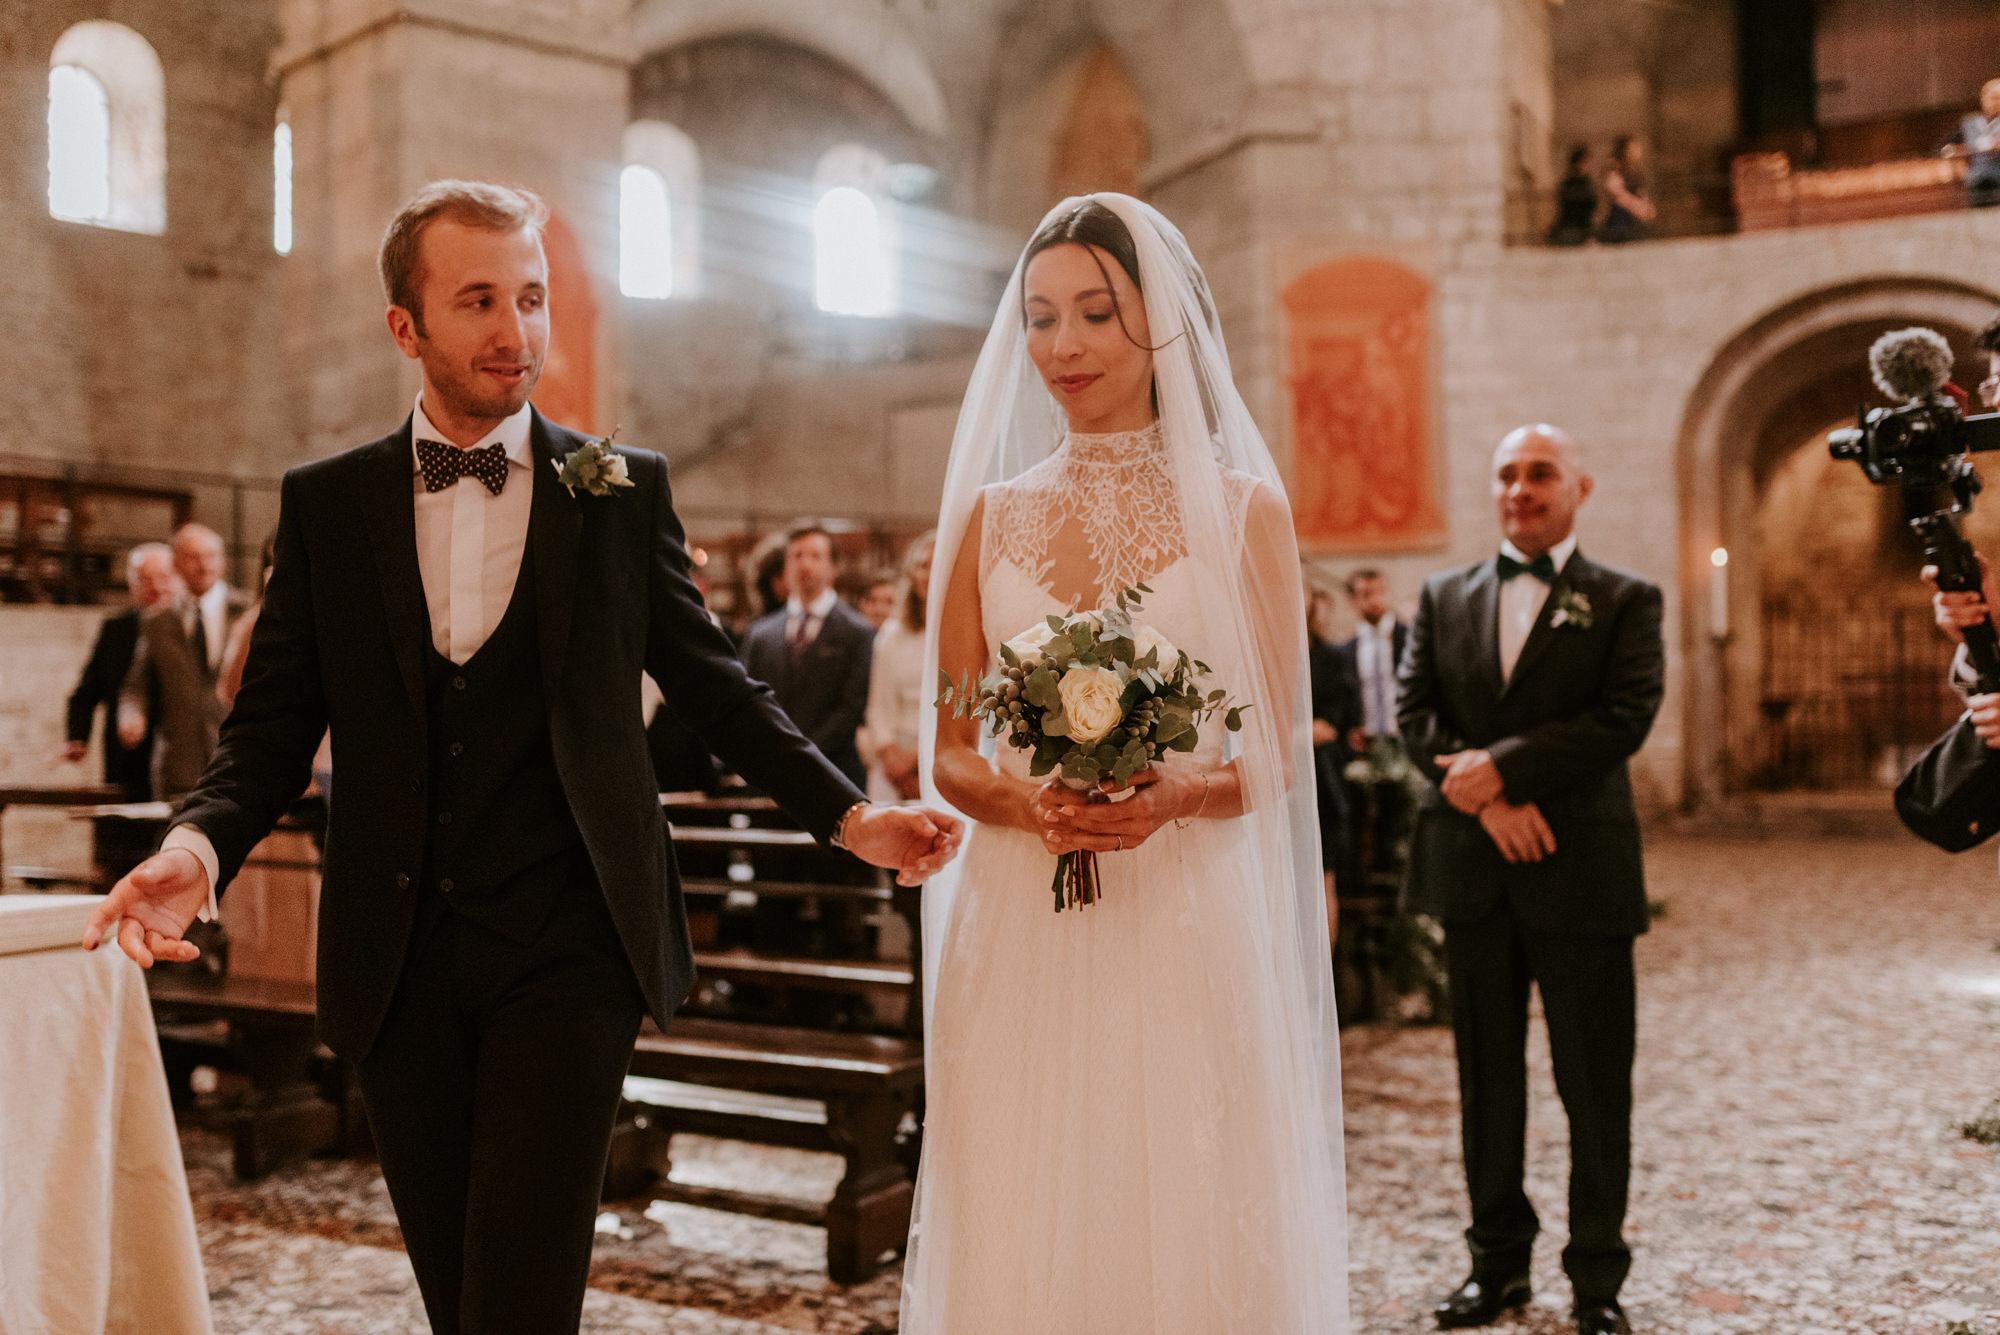 FOTO+PHOTO+BODA+WEDDING+ITALIA+ITALY+MAURICIO+GARAY+MAURICIOGARAY+WEDDINPHOTOGRAPHER+FOTOGRAFODEBODA-768.jpg